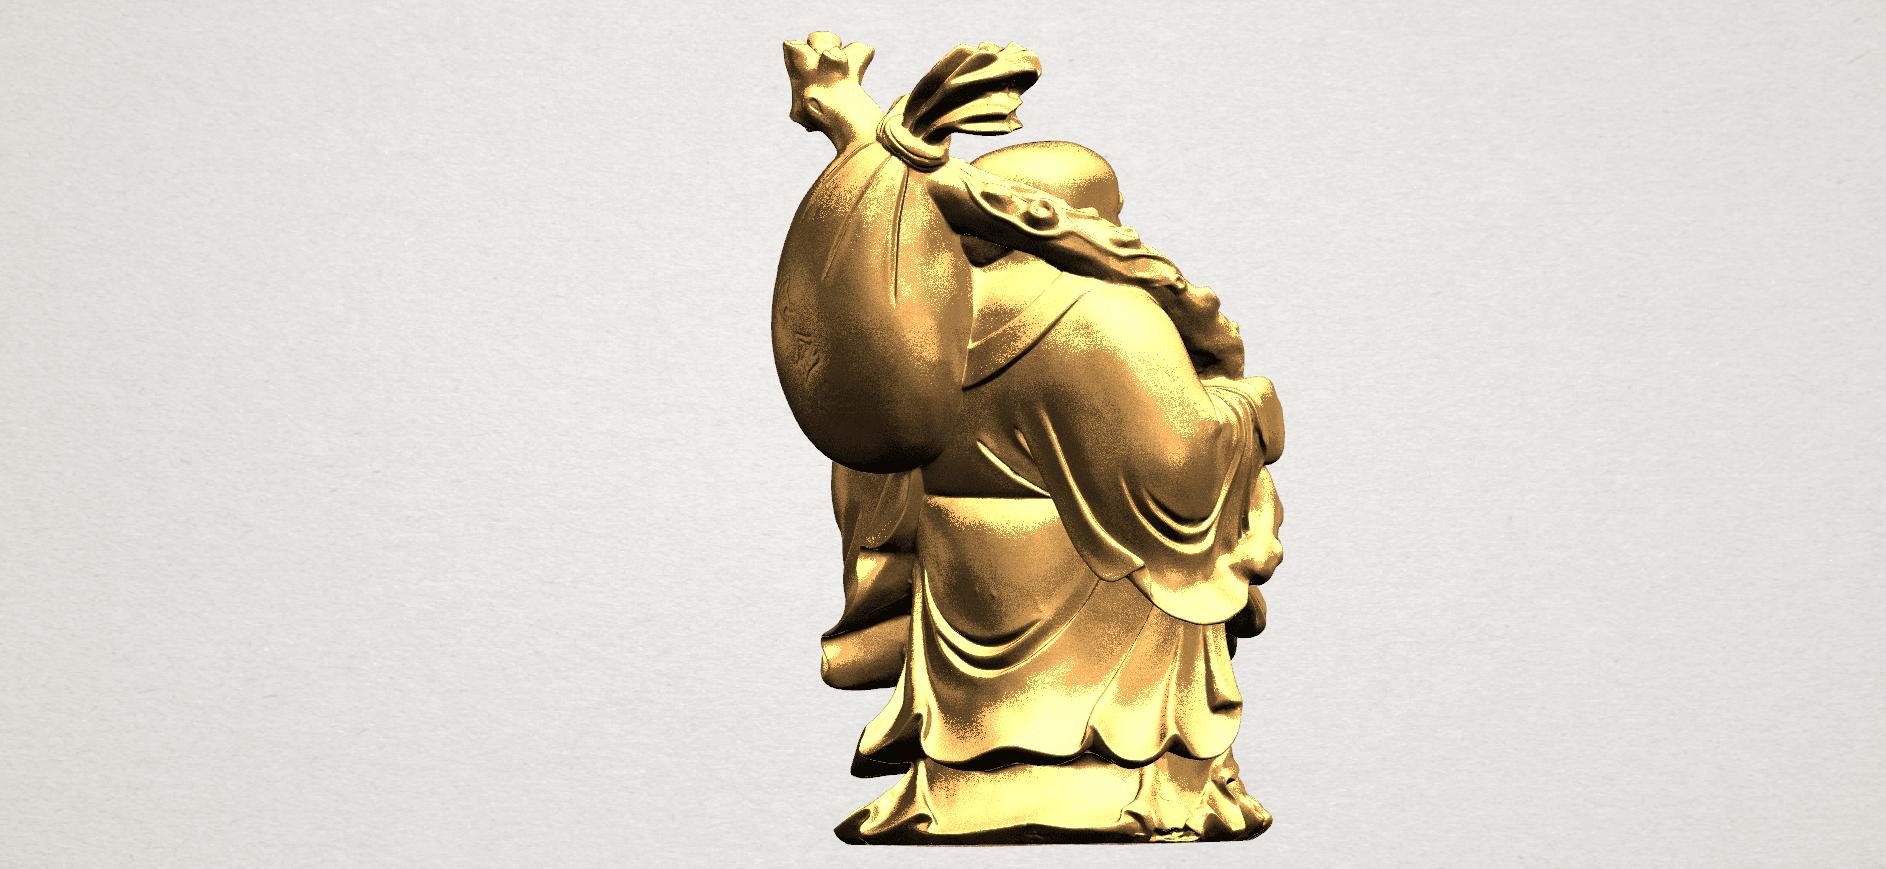 Metteyya Buddha 05 - 88mm - A06.png Télécharger fichier STL gratuit Bouddha Metteyya 05 • Objet imprimable en 3D, GeorgesNikkei